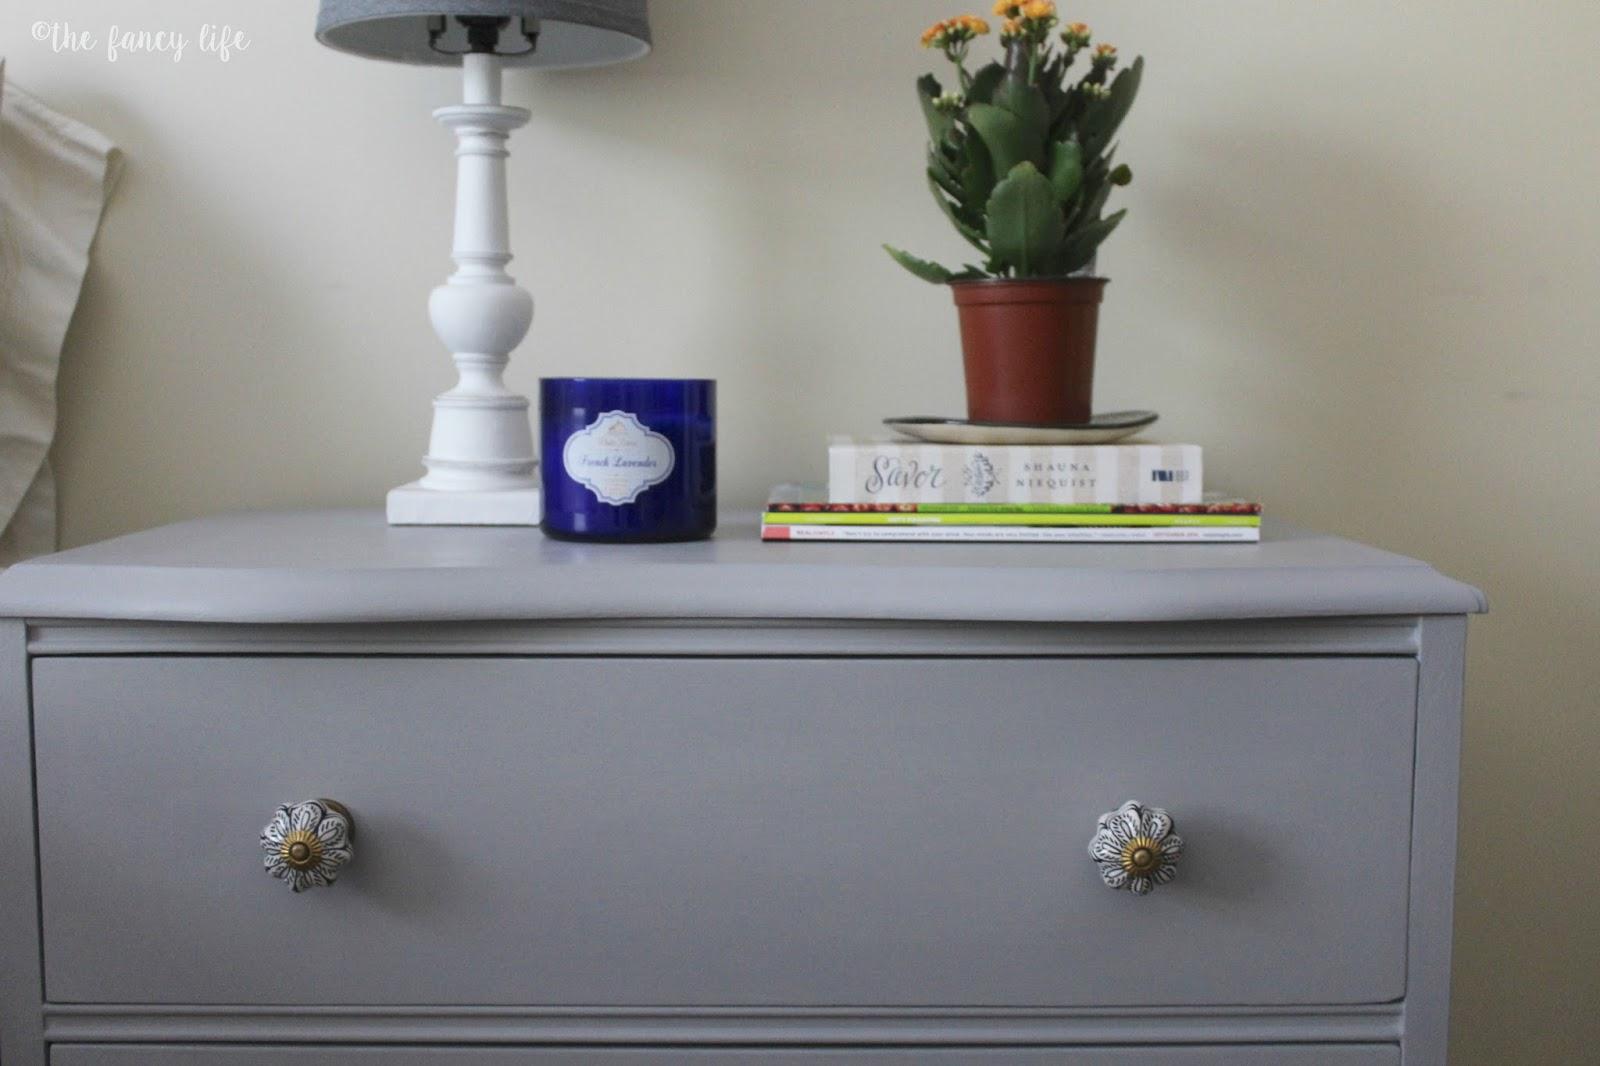 the fancy life Bedroom Side Tables Part II